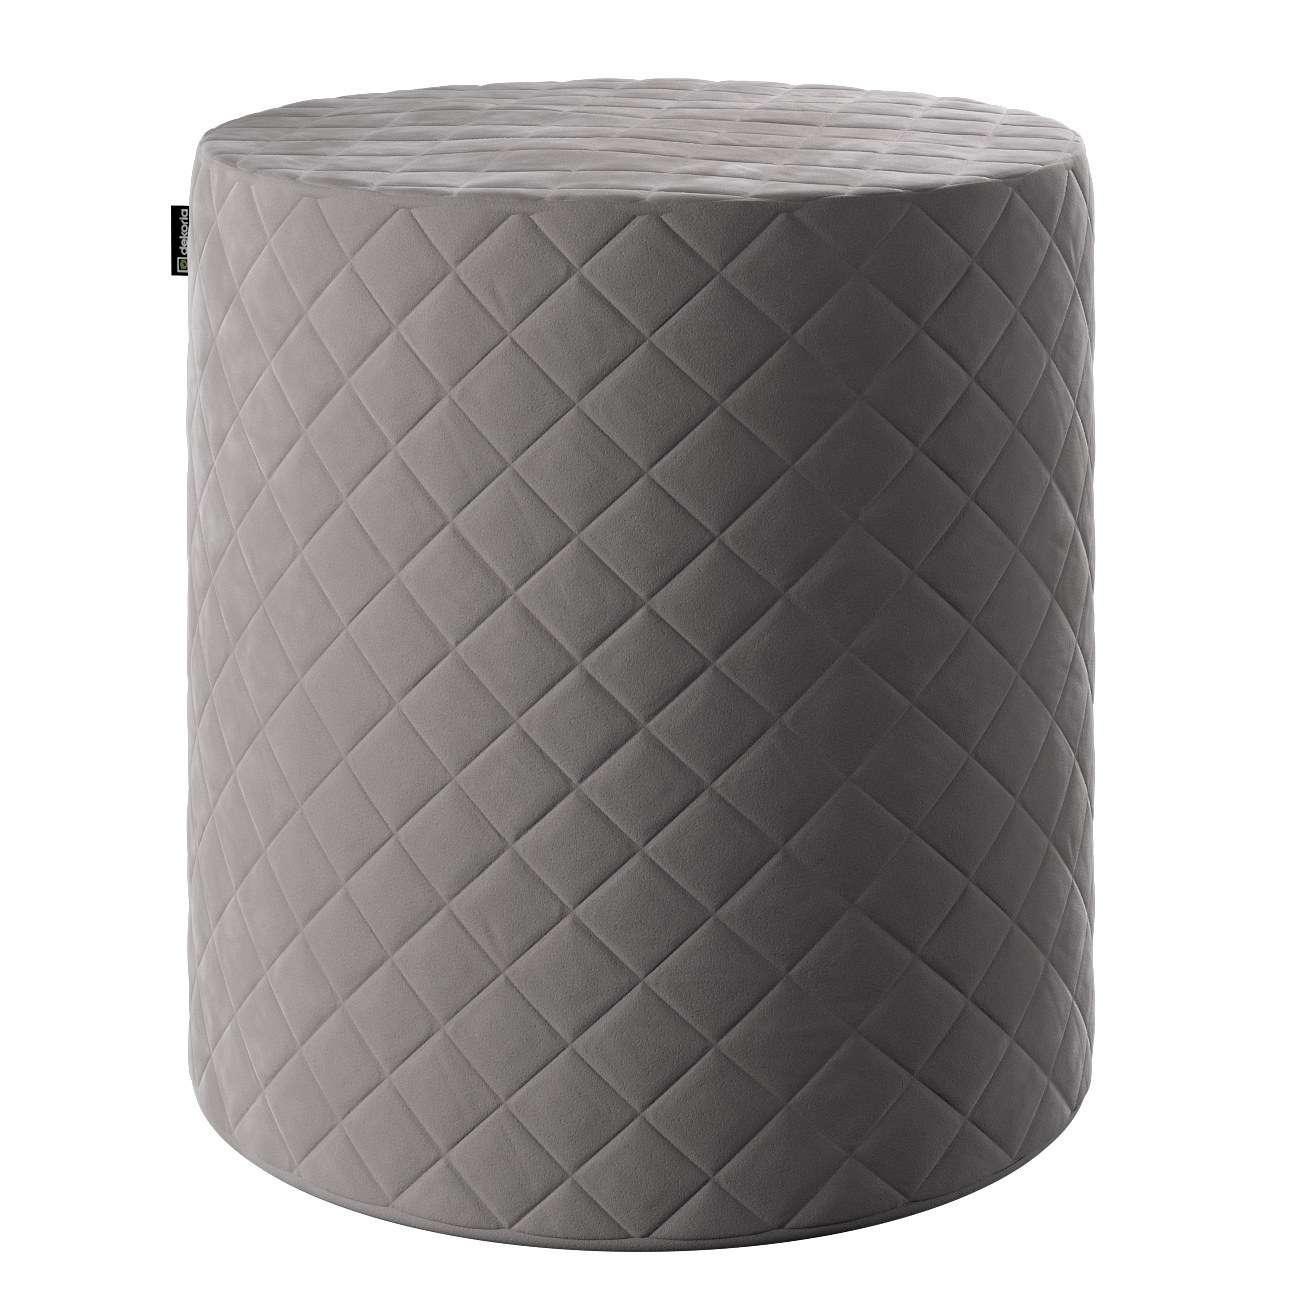 Puf Barrel pikowany w kolekcji Velvet, tkanina: 704-11